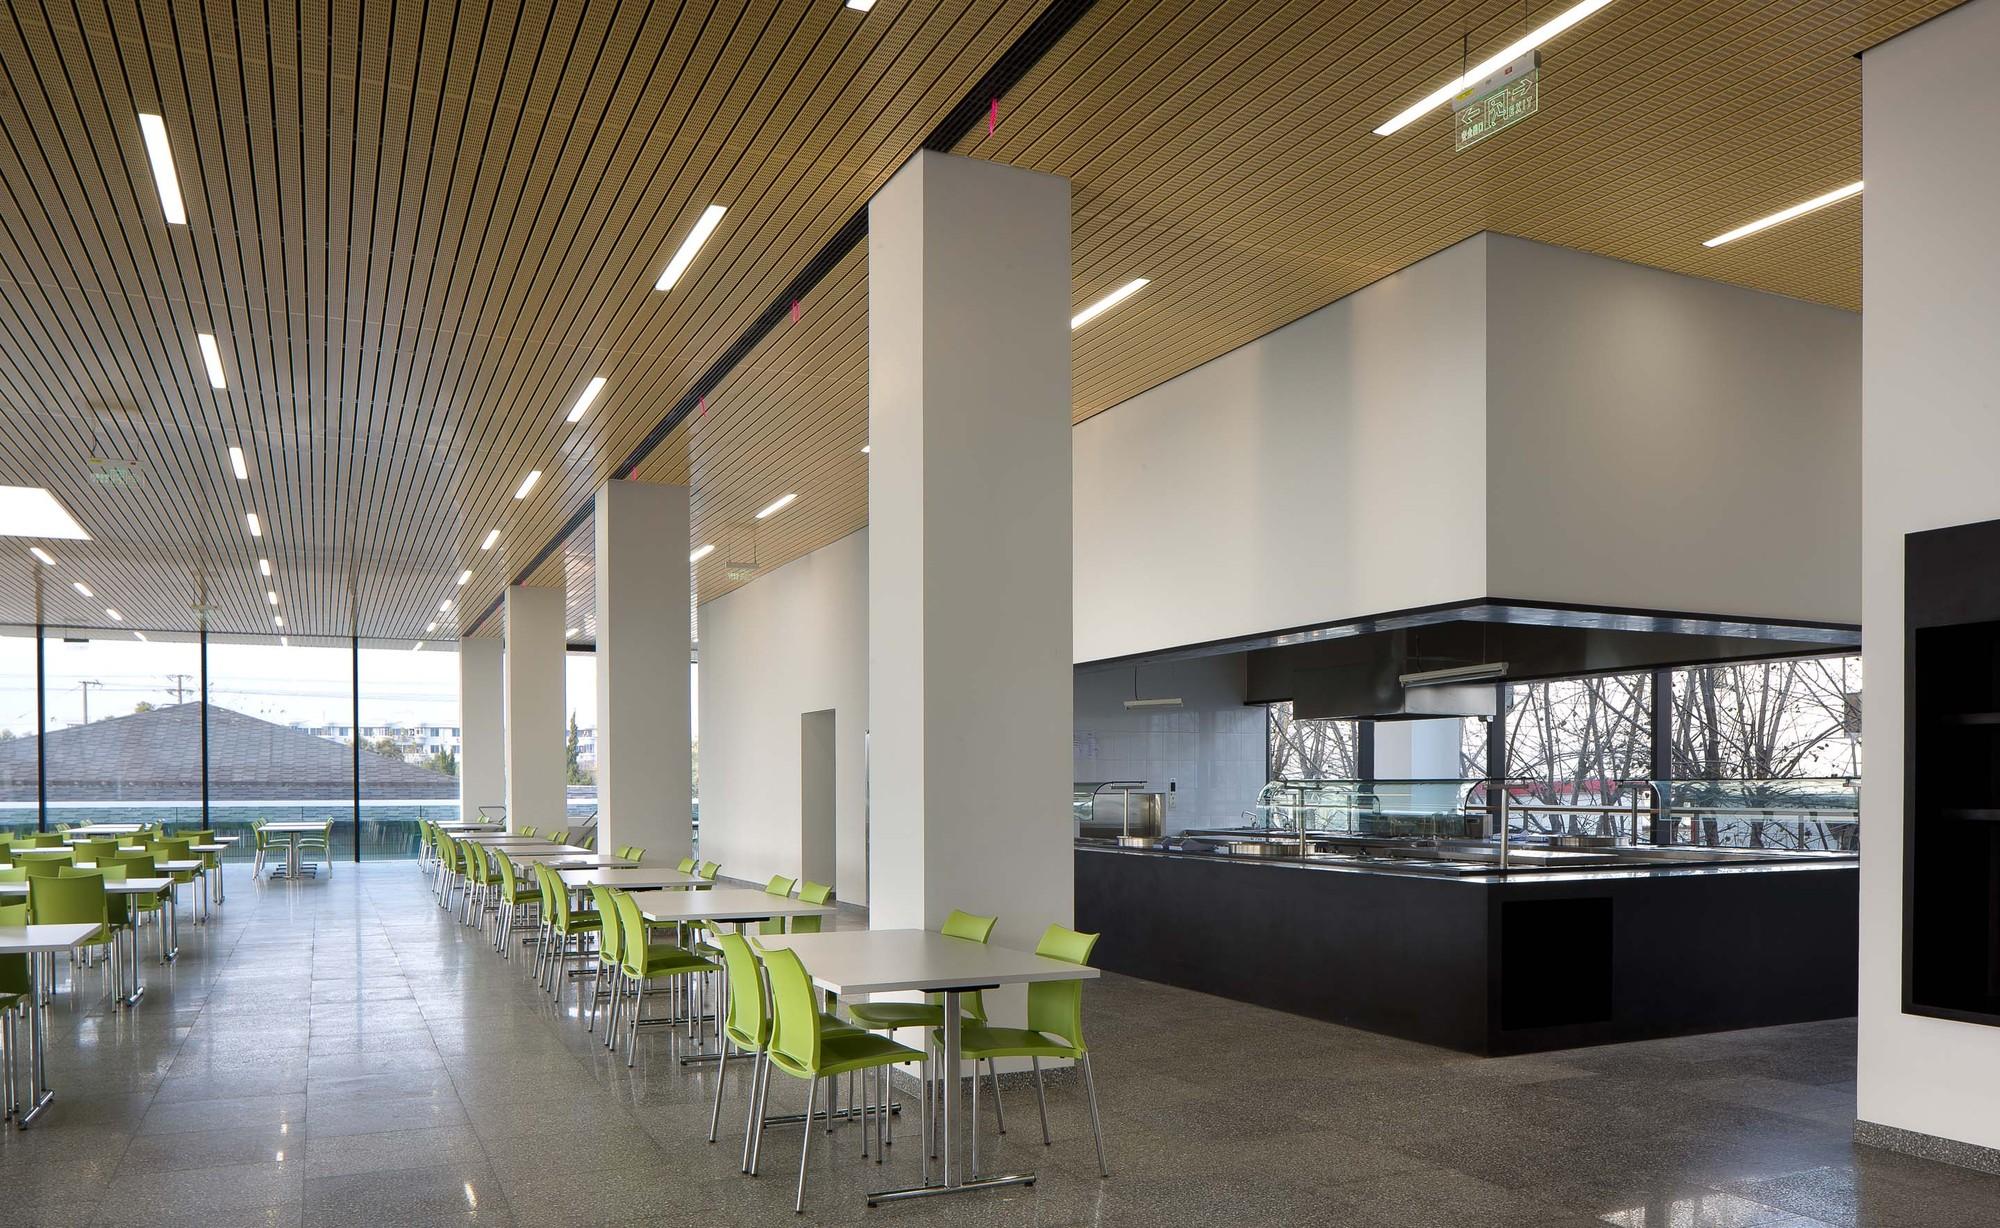 Gallery Of Roche Canteen Exh Design 4